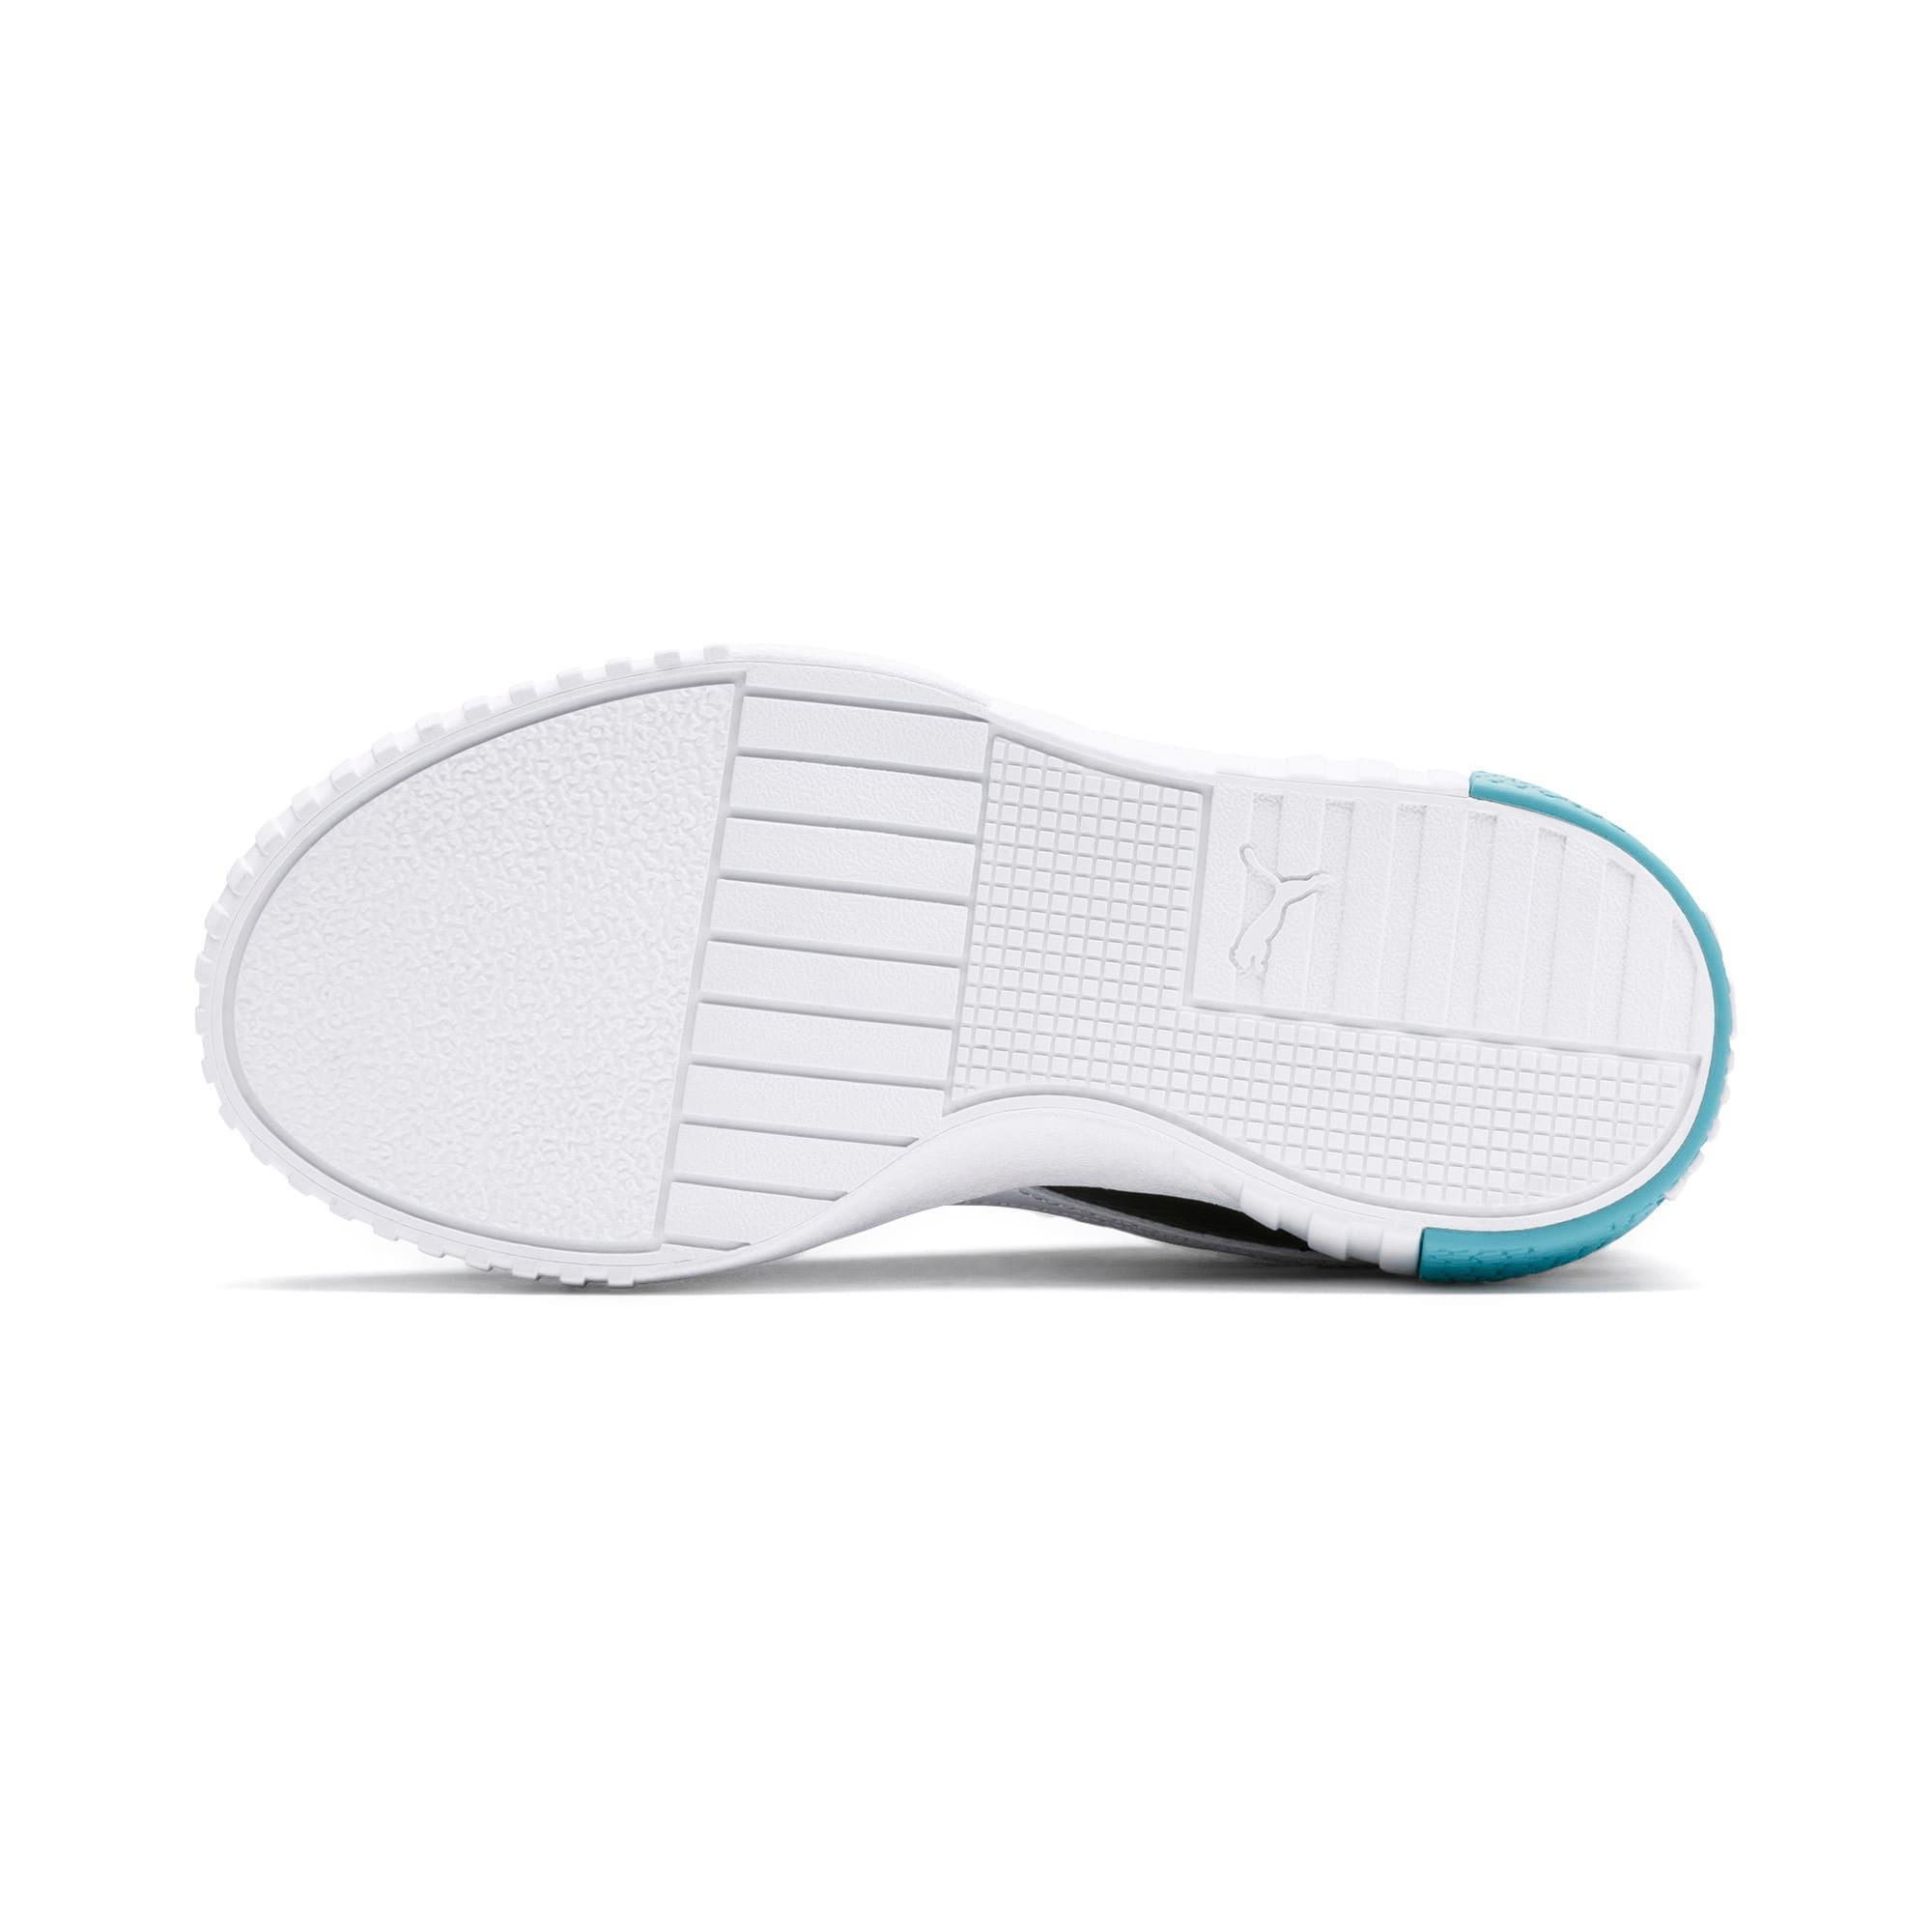 Thumbnail 4 of Cali Little Kids' Shoes, Puma Black-Milky Blue, medium